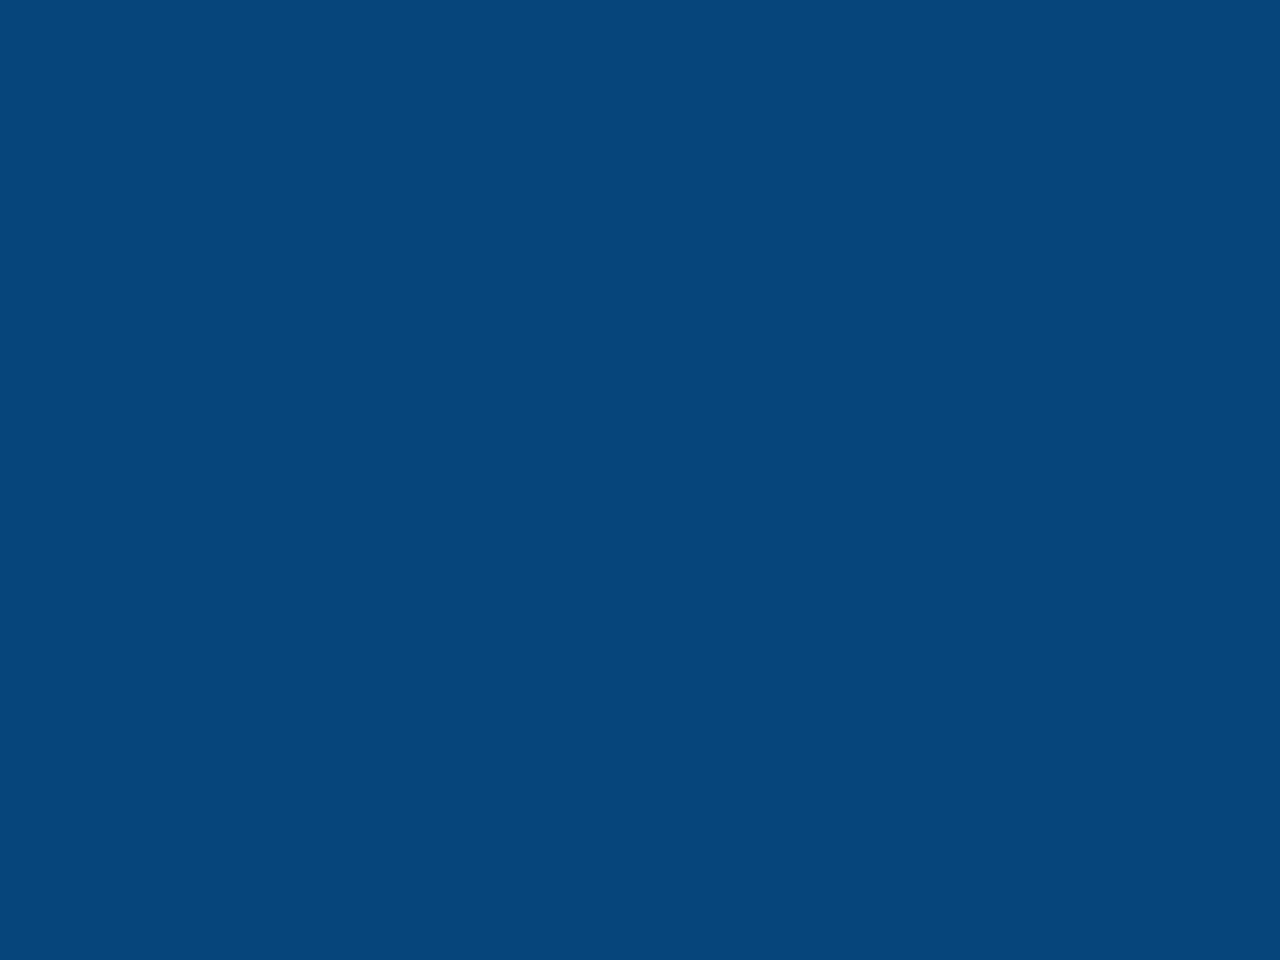 1280x960 Dark Cerulean Solid Color Background